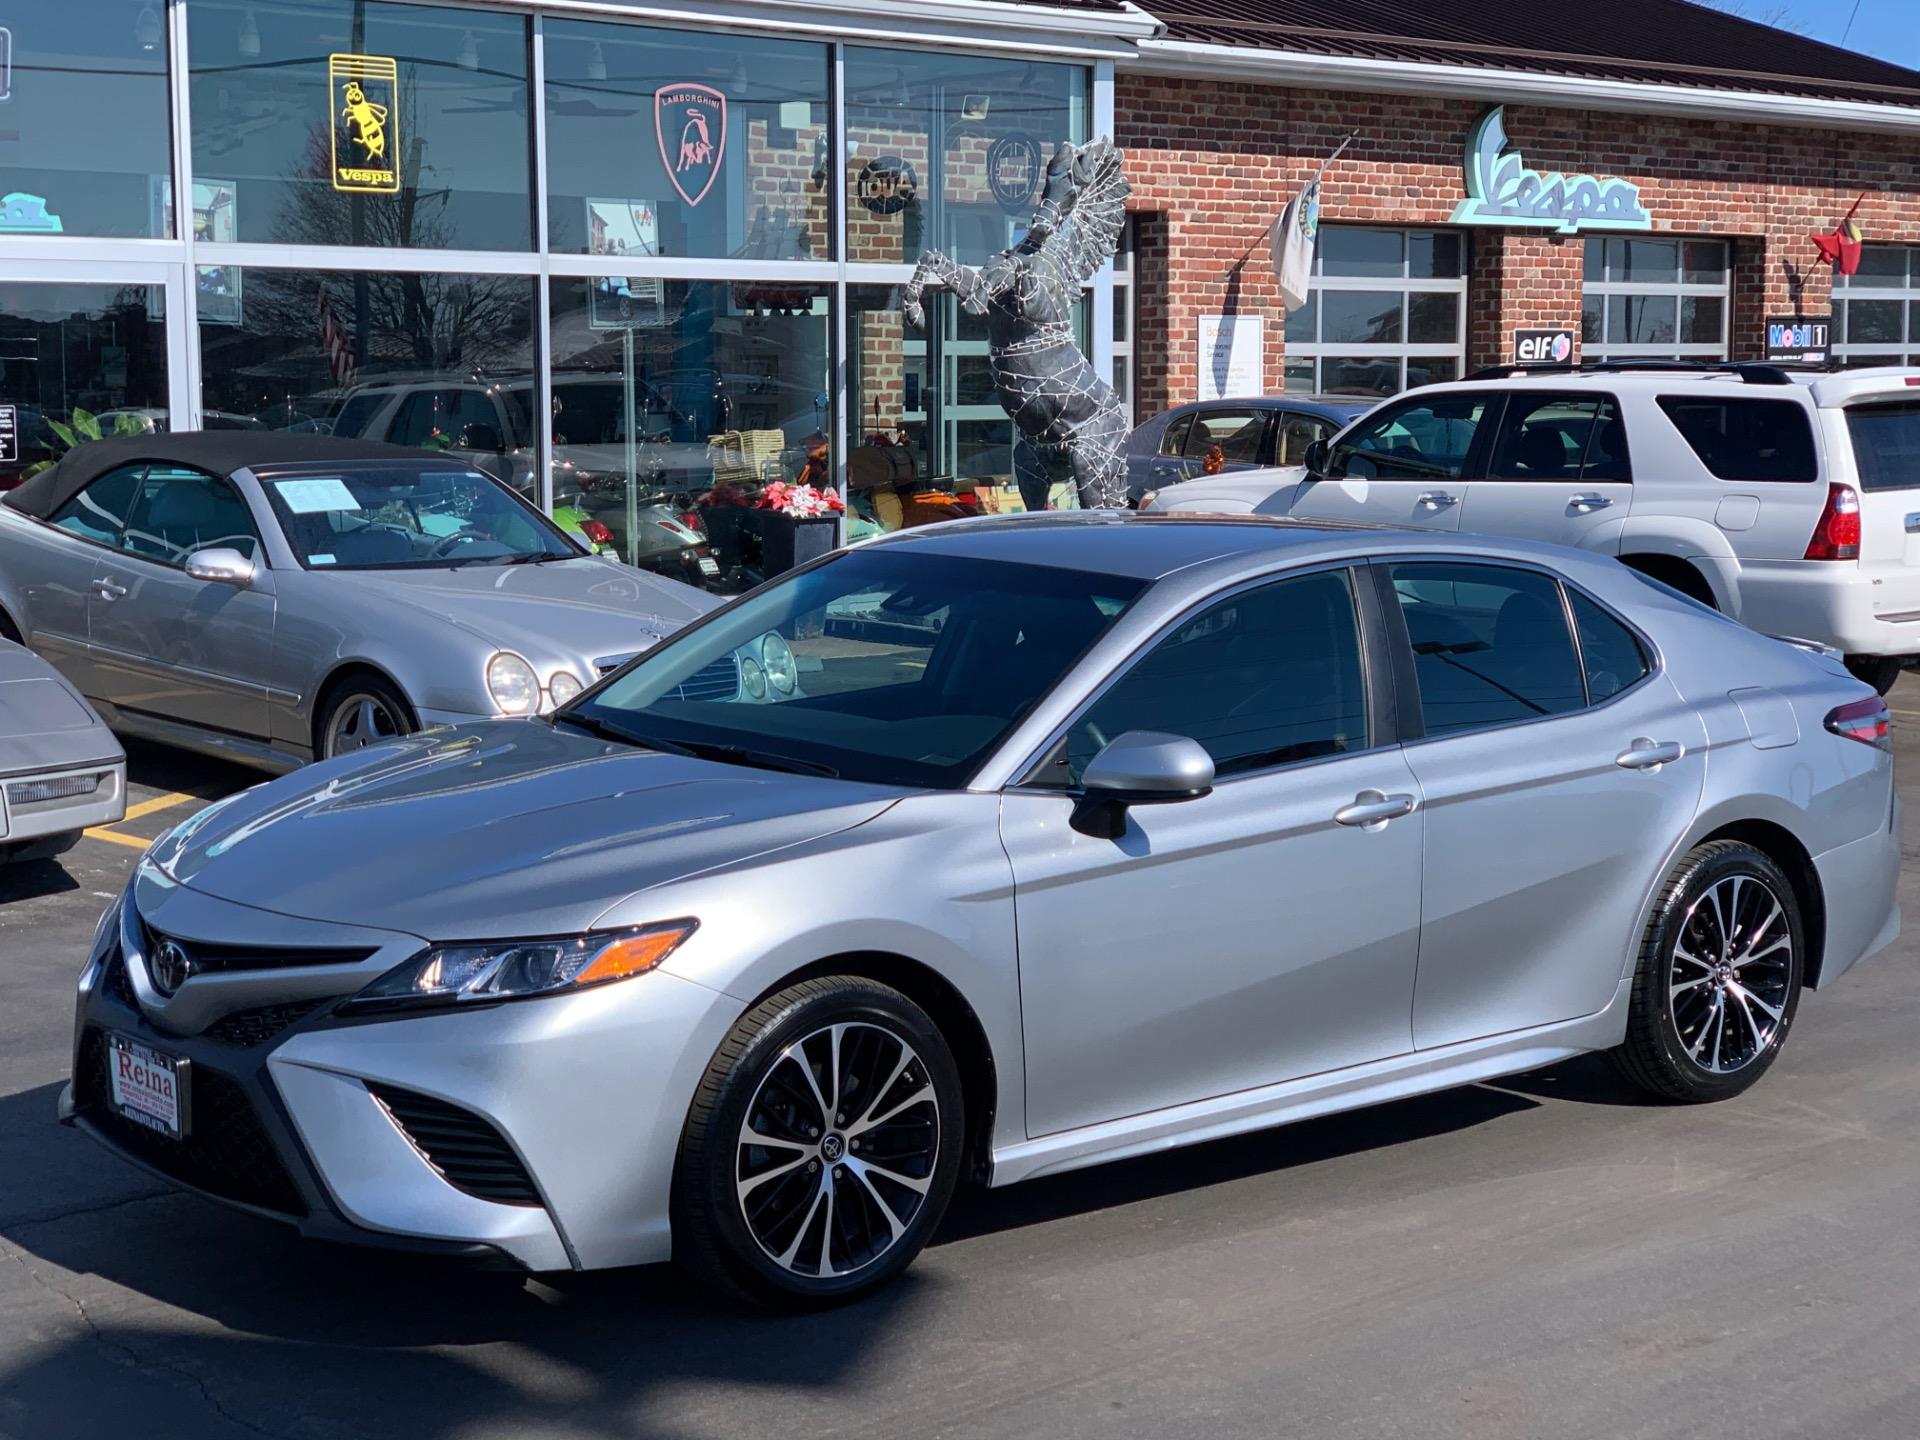 Used-2018-Toyota-Camry-SE-w/Adaptive-Cruise-Control